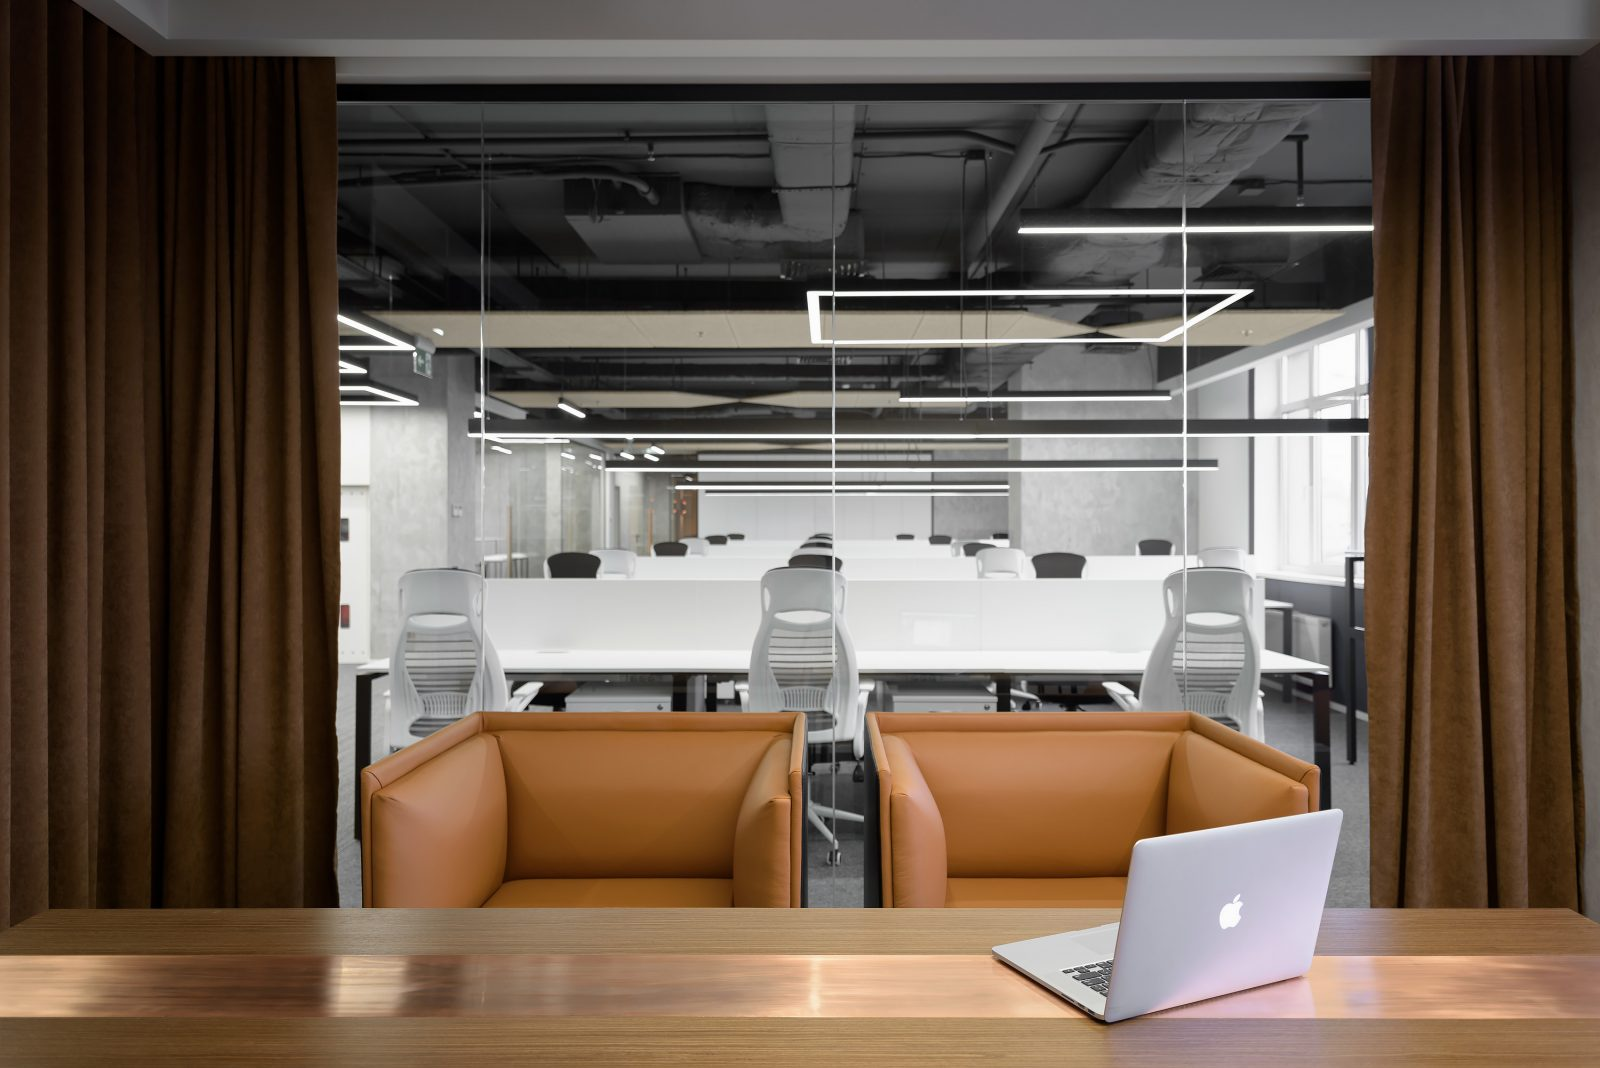 U.S.-based Furniture Startups